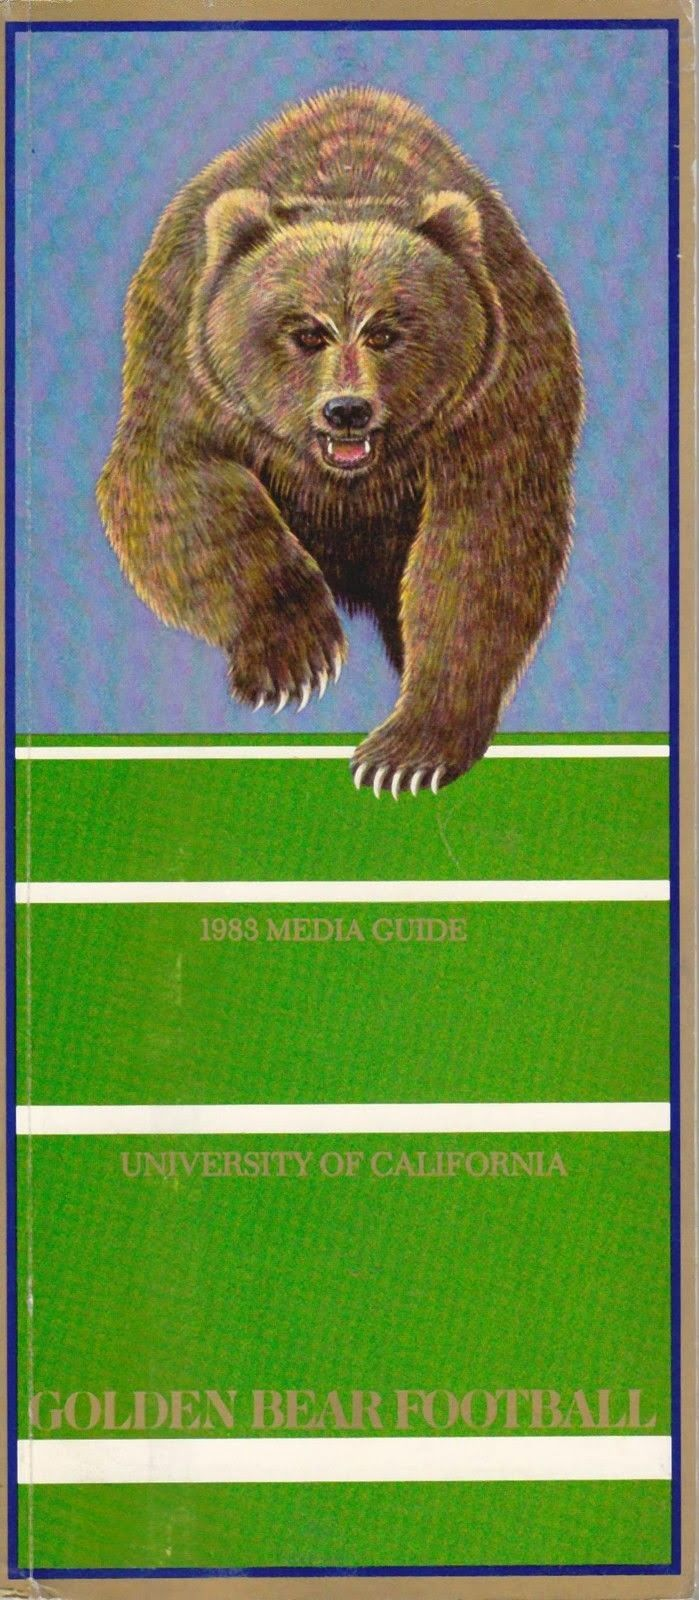 Cal Bear Football Grizzly Media Guide   Bear Flag Museum